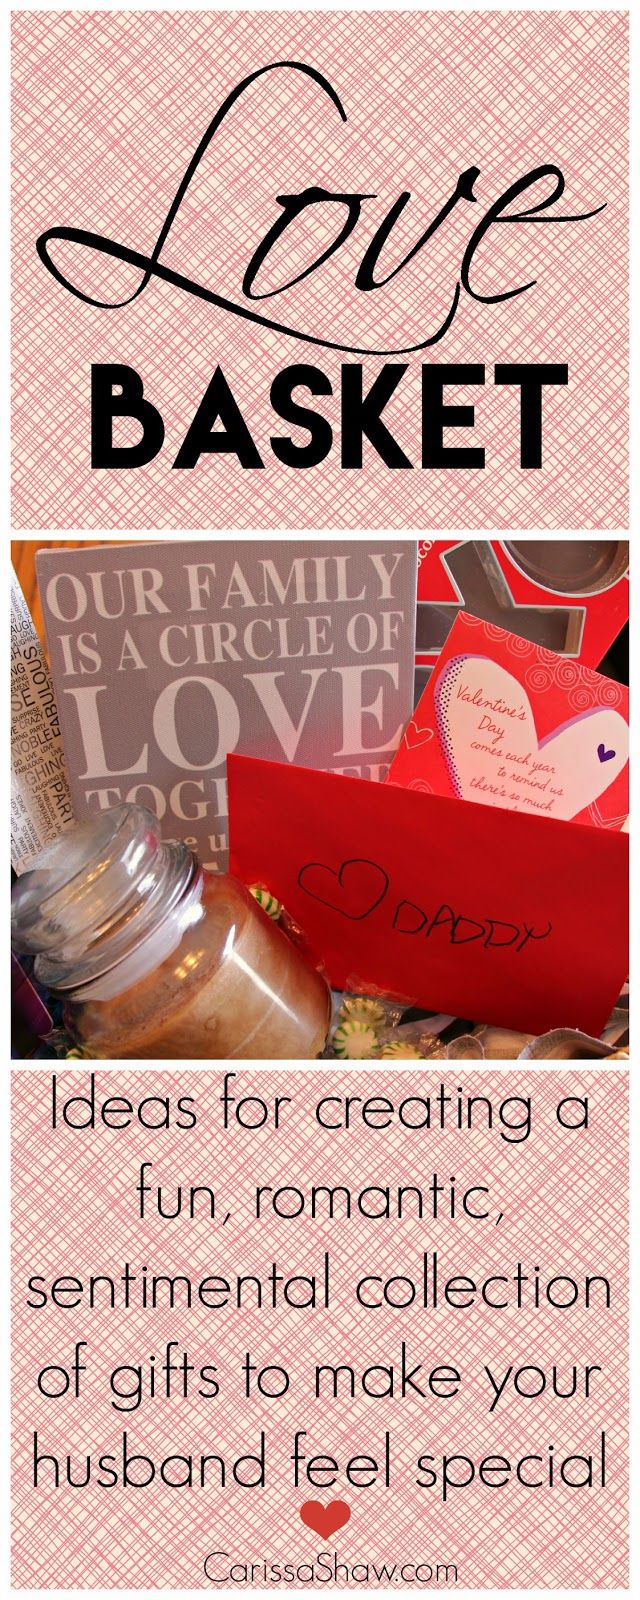 89 best Romantic ideas images on Pinterest | Romantic ideas, Happy ...